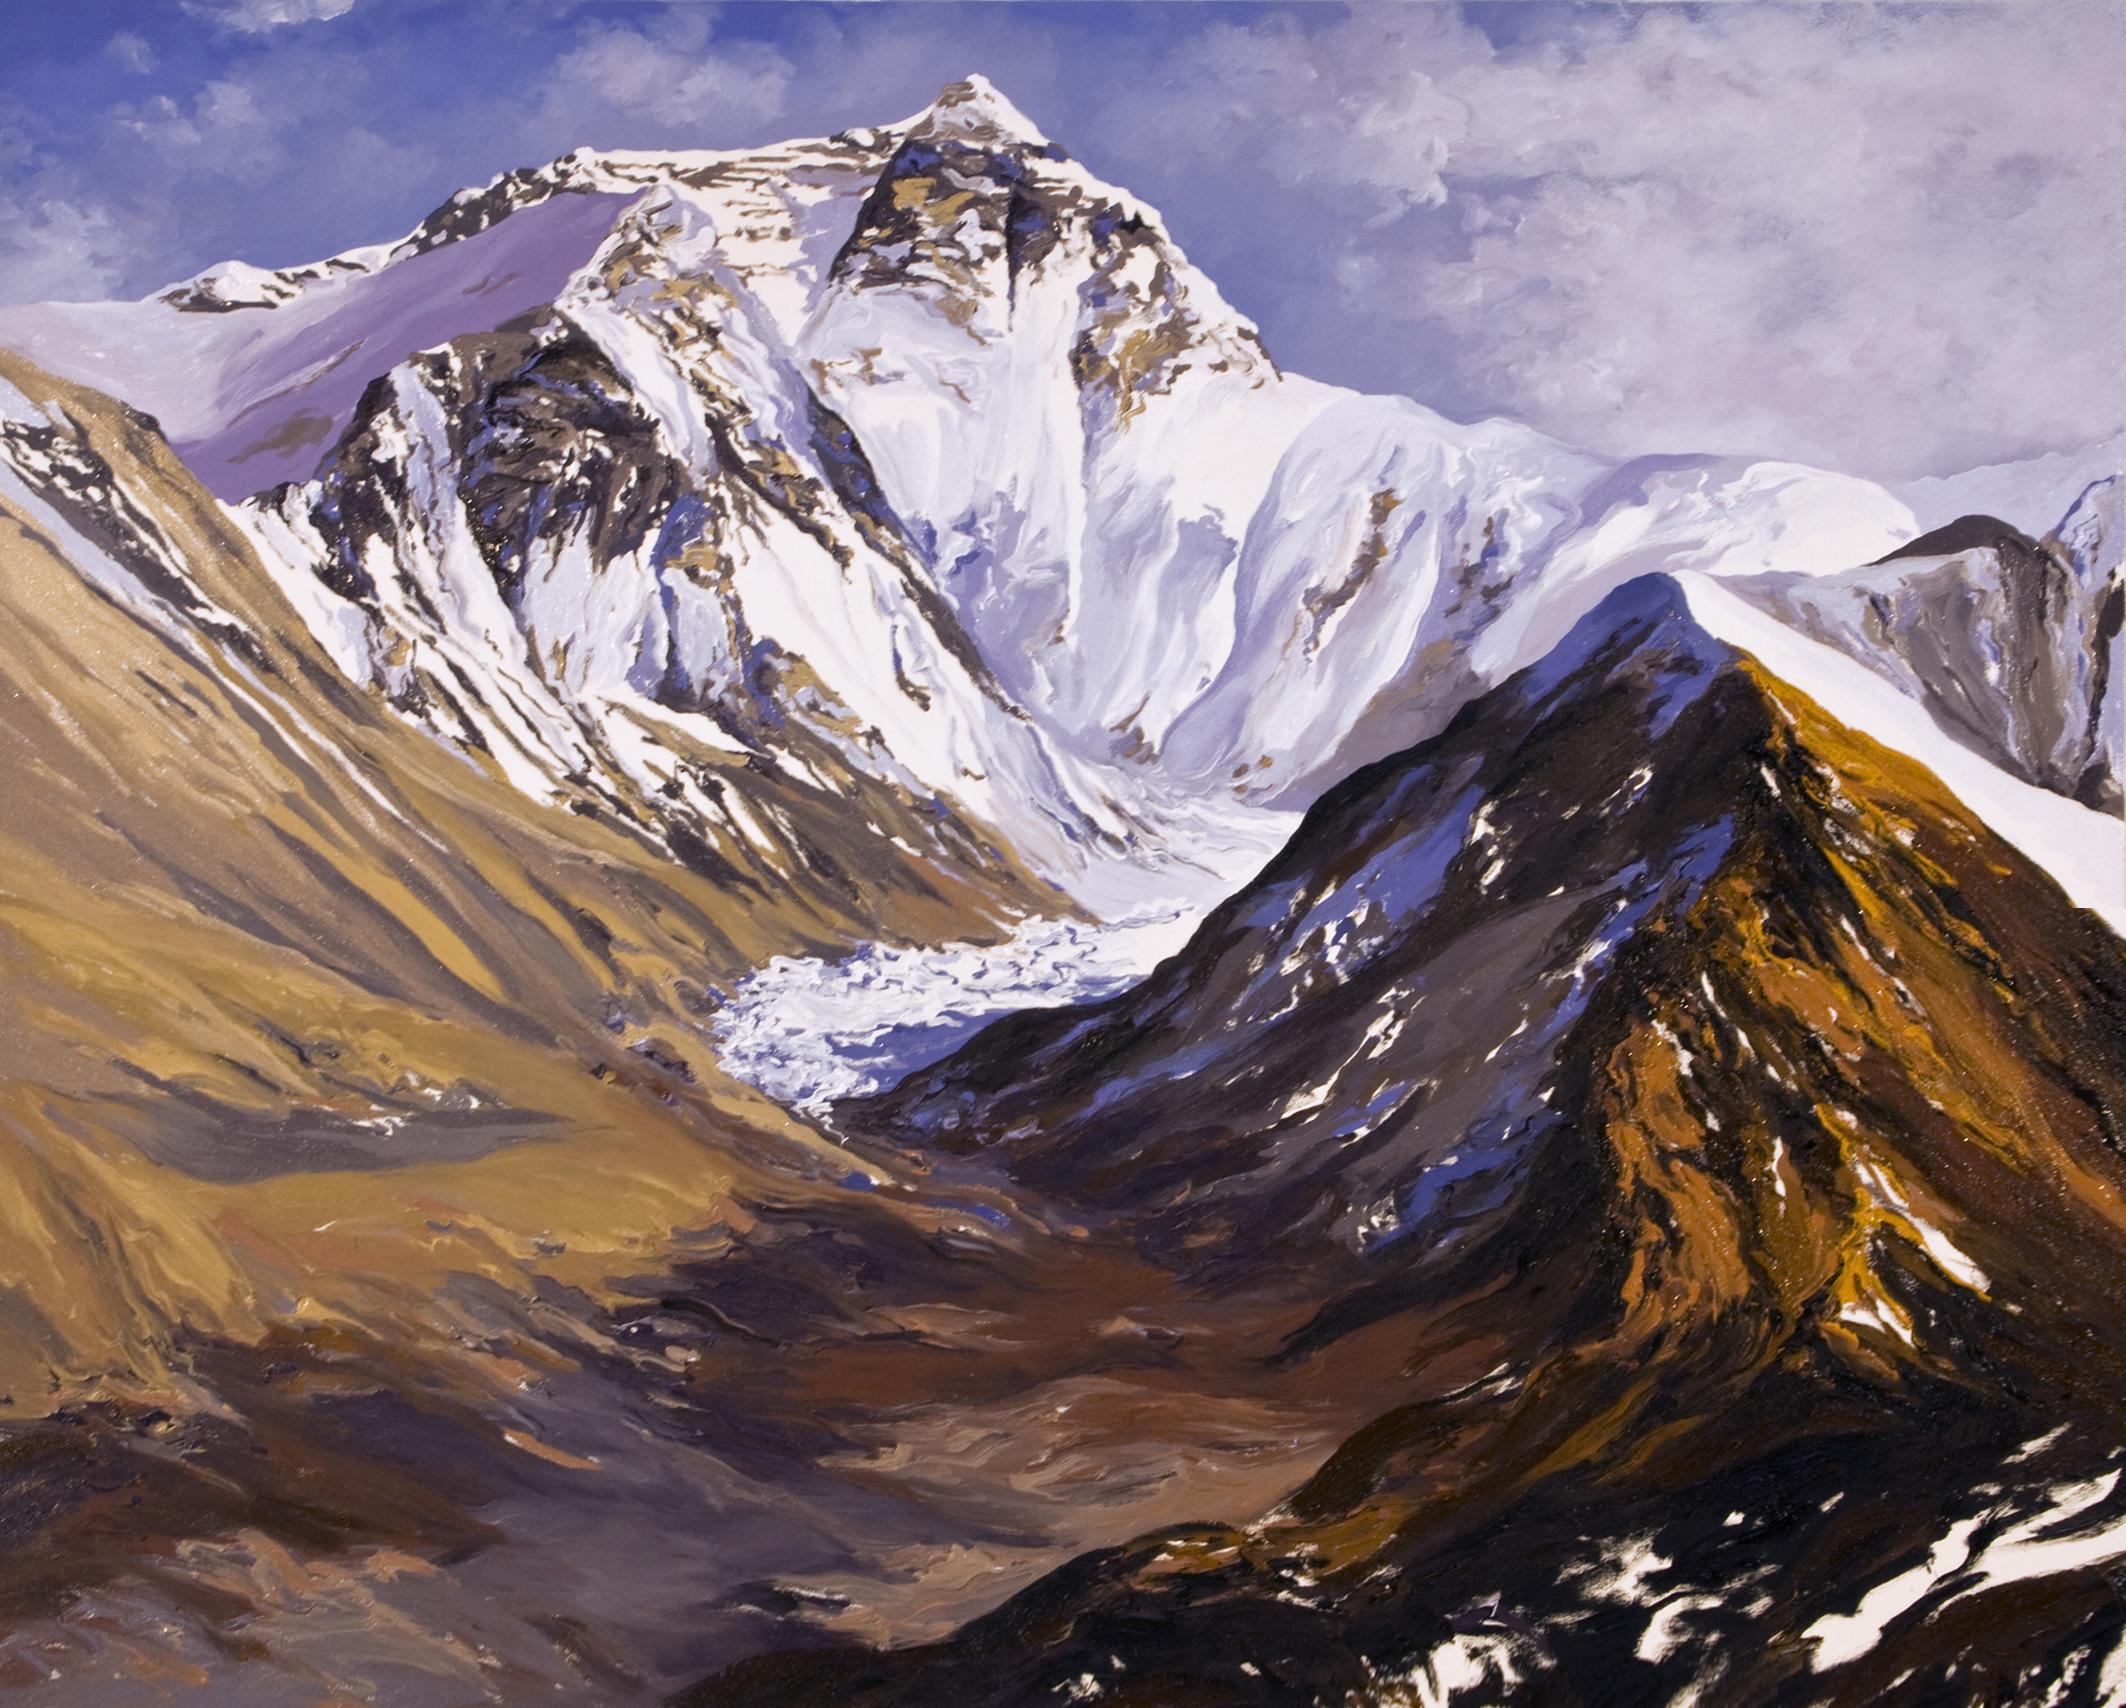 #3, Main Rongbuk Glacier, Future, after Diane Burko